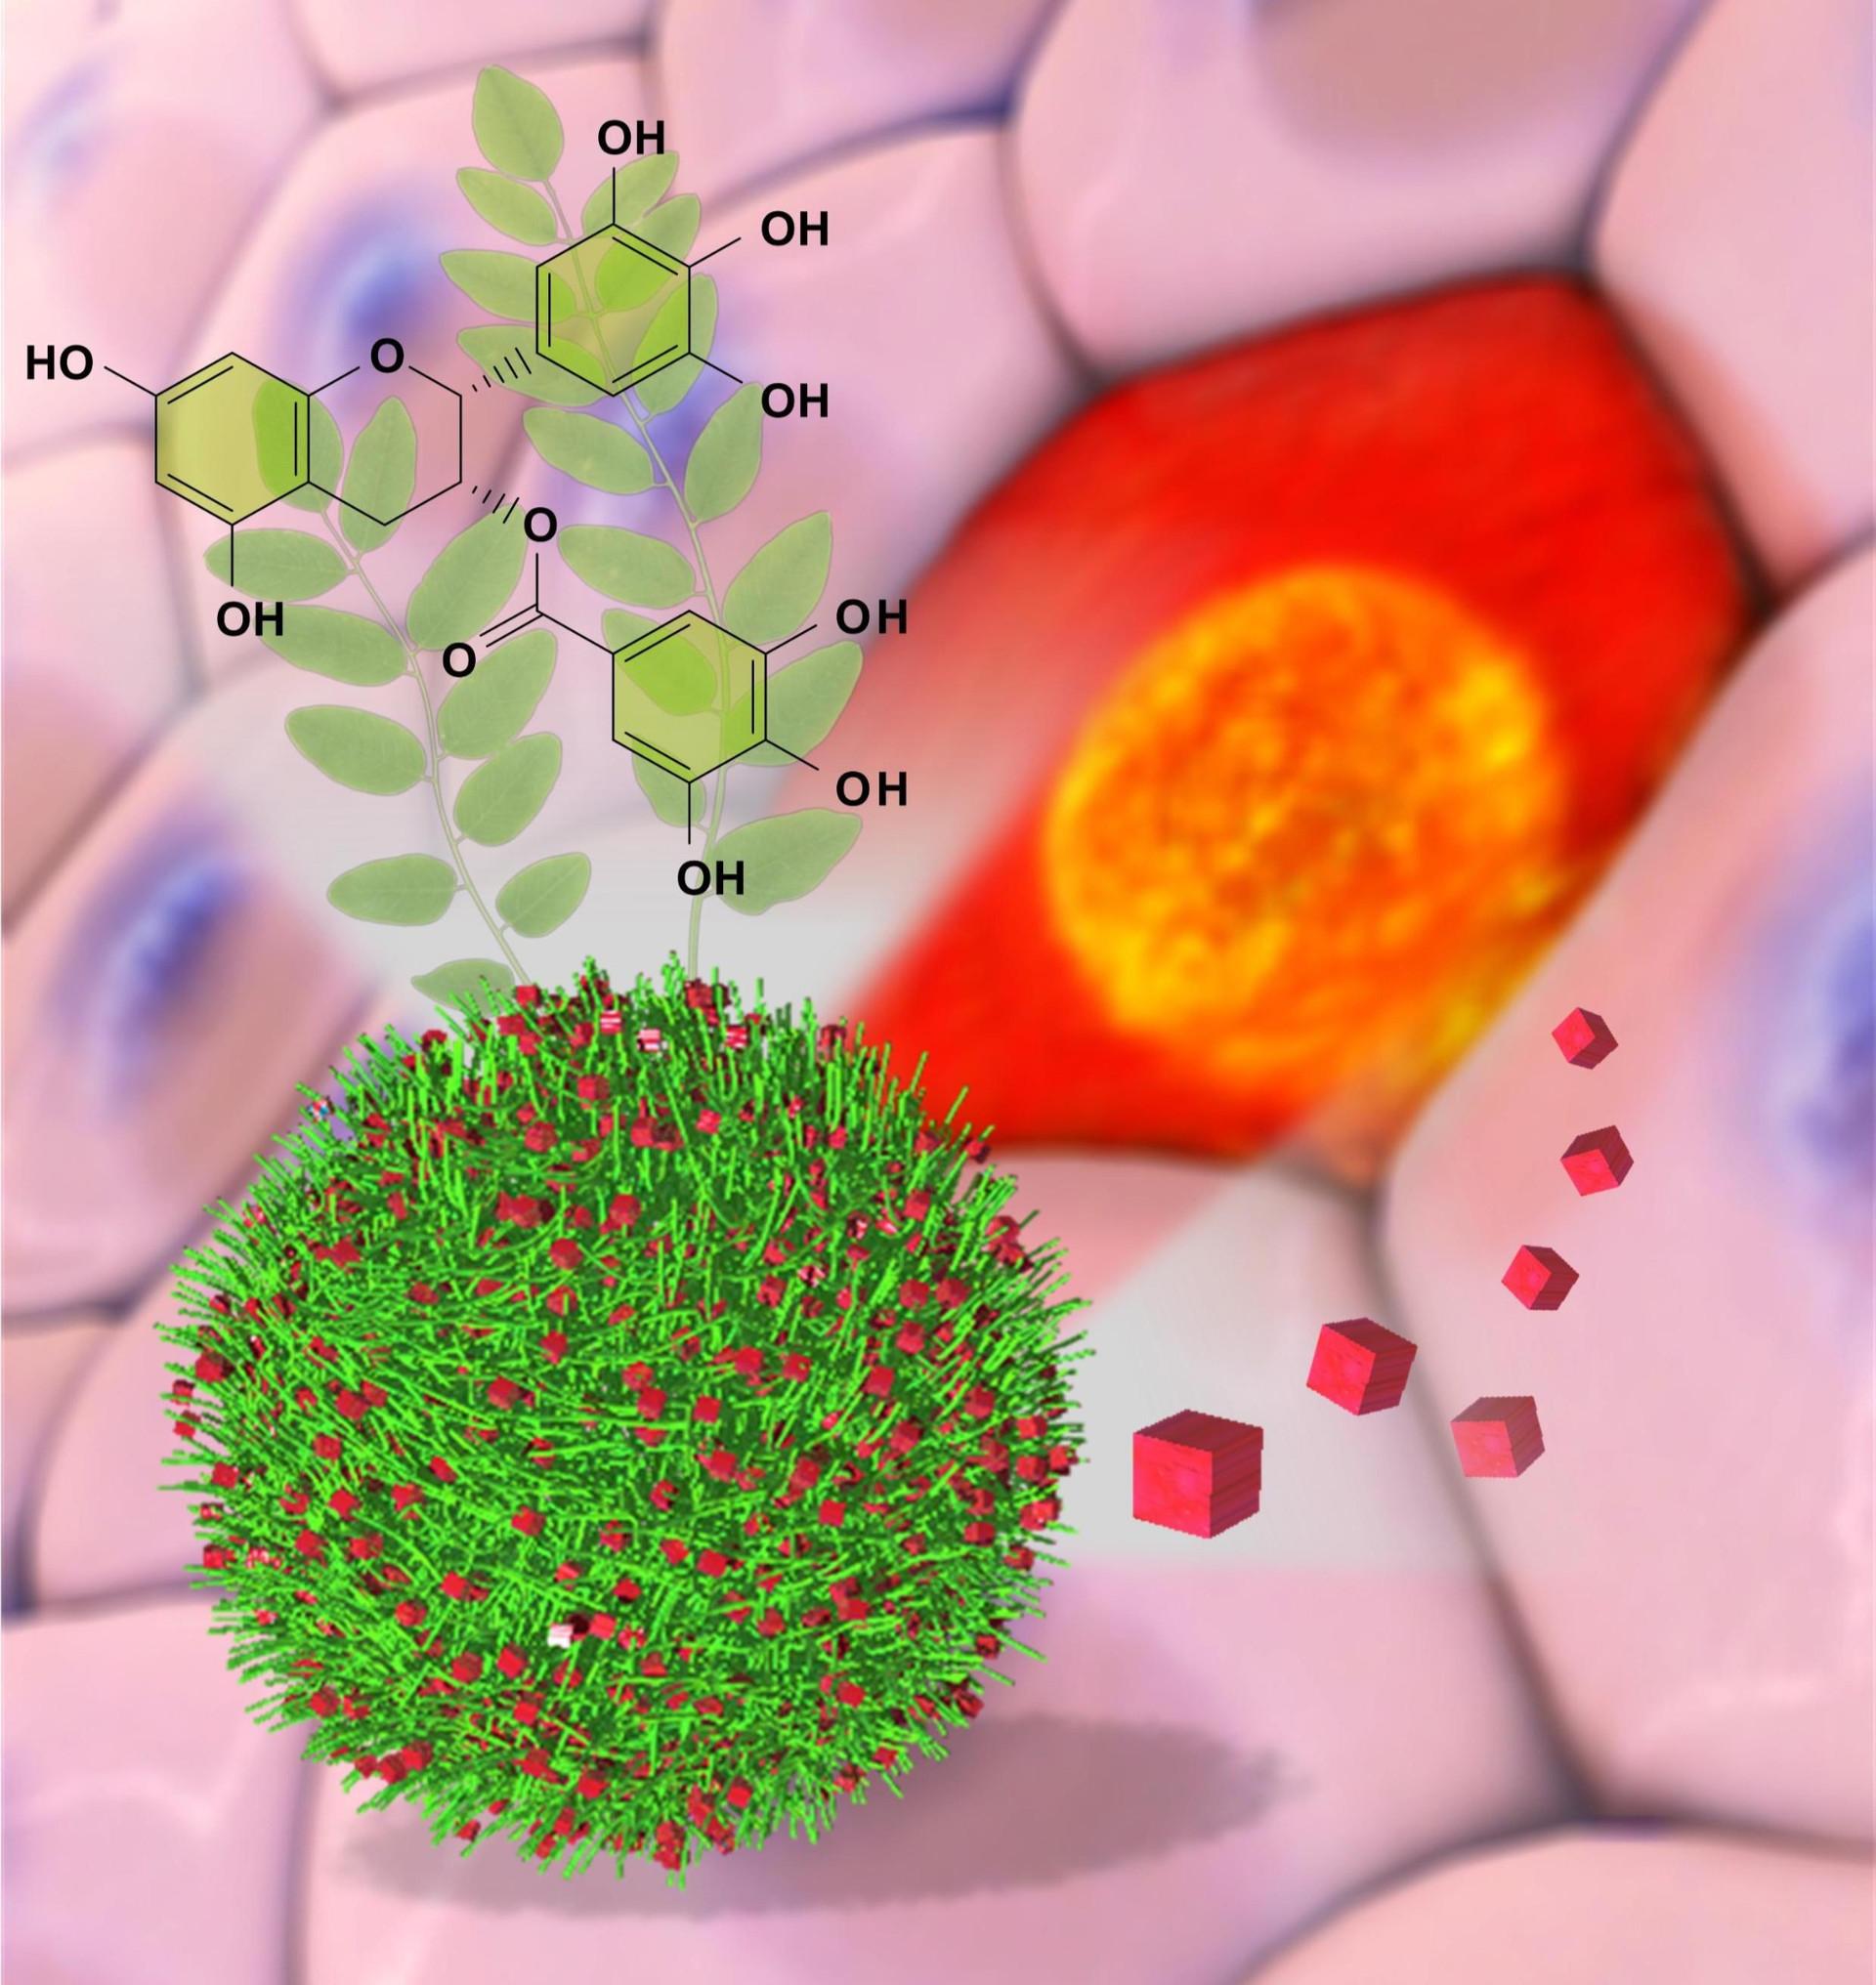 Bio-Nano Interface and Biomedical Engineering